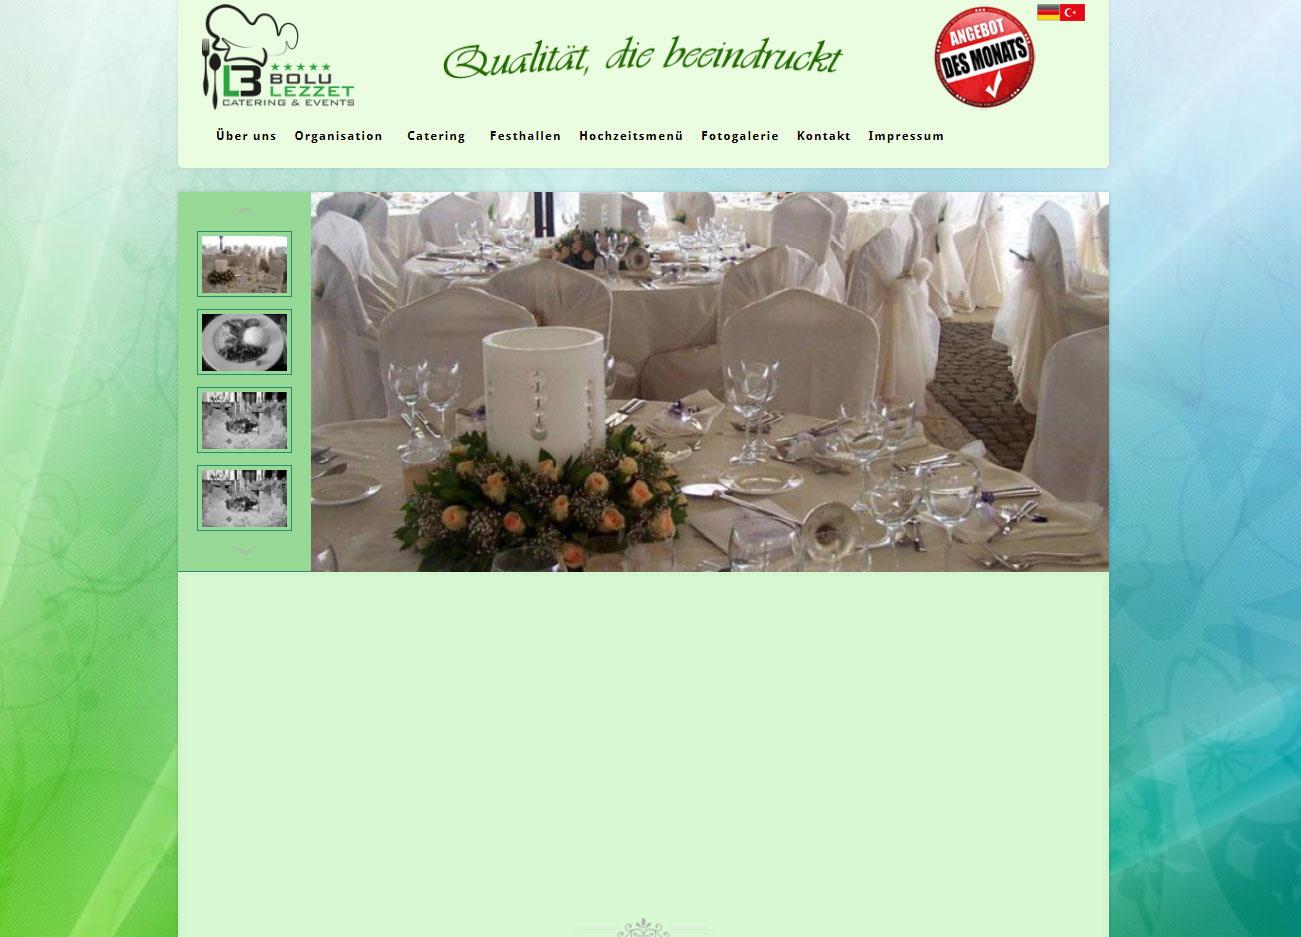 Bolu Lezzet Catering